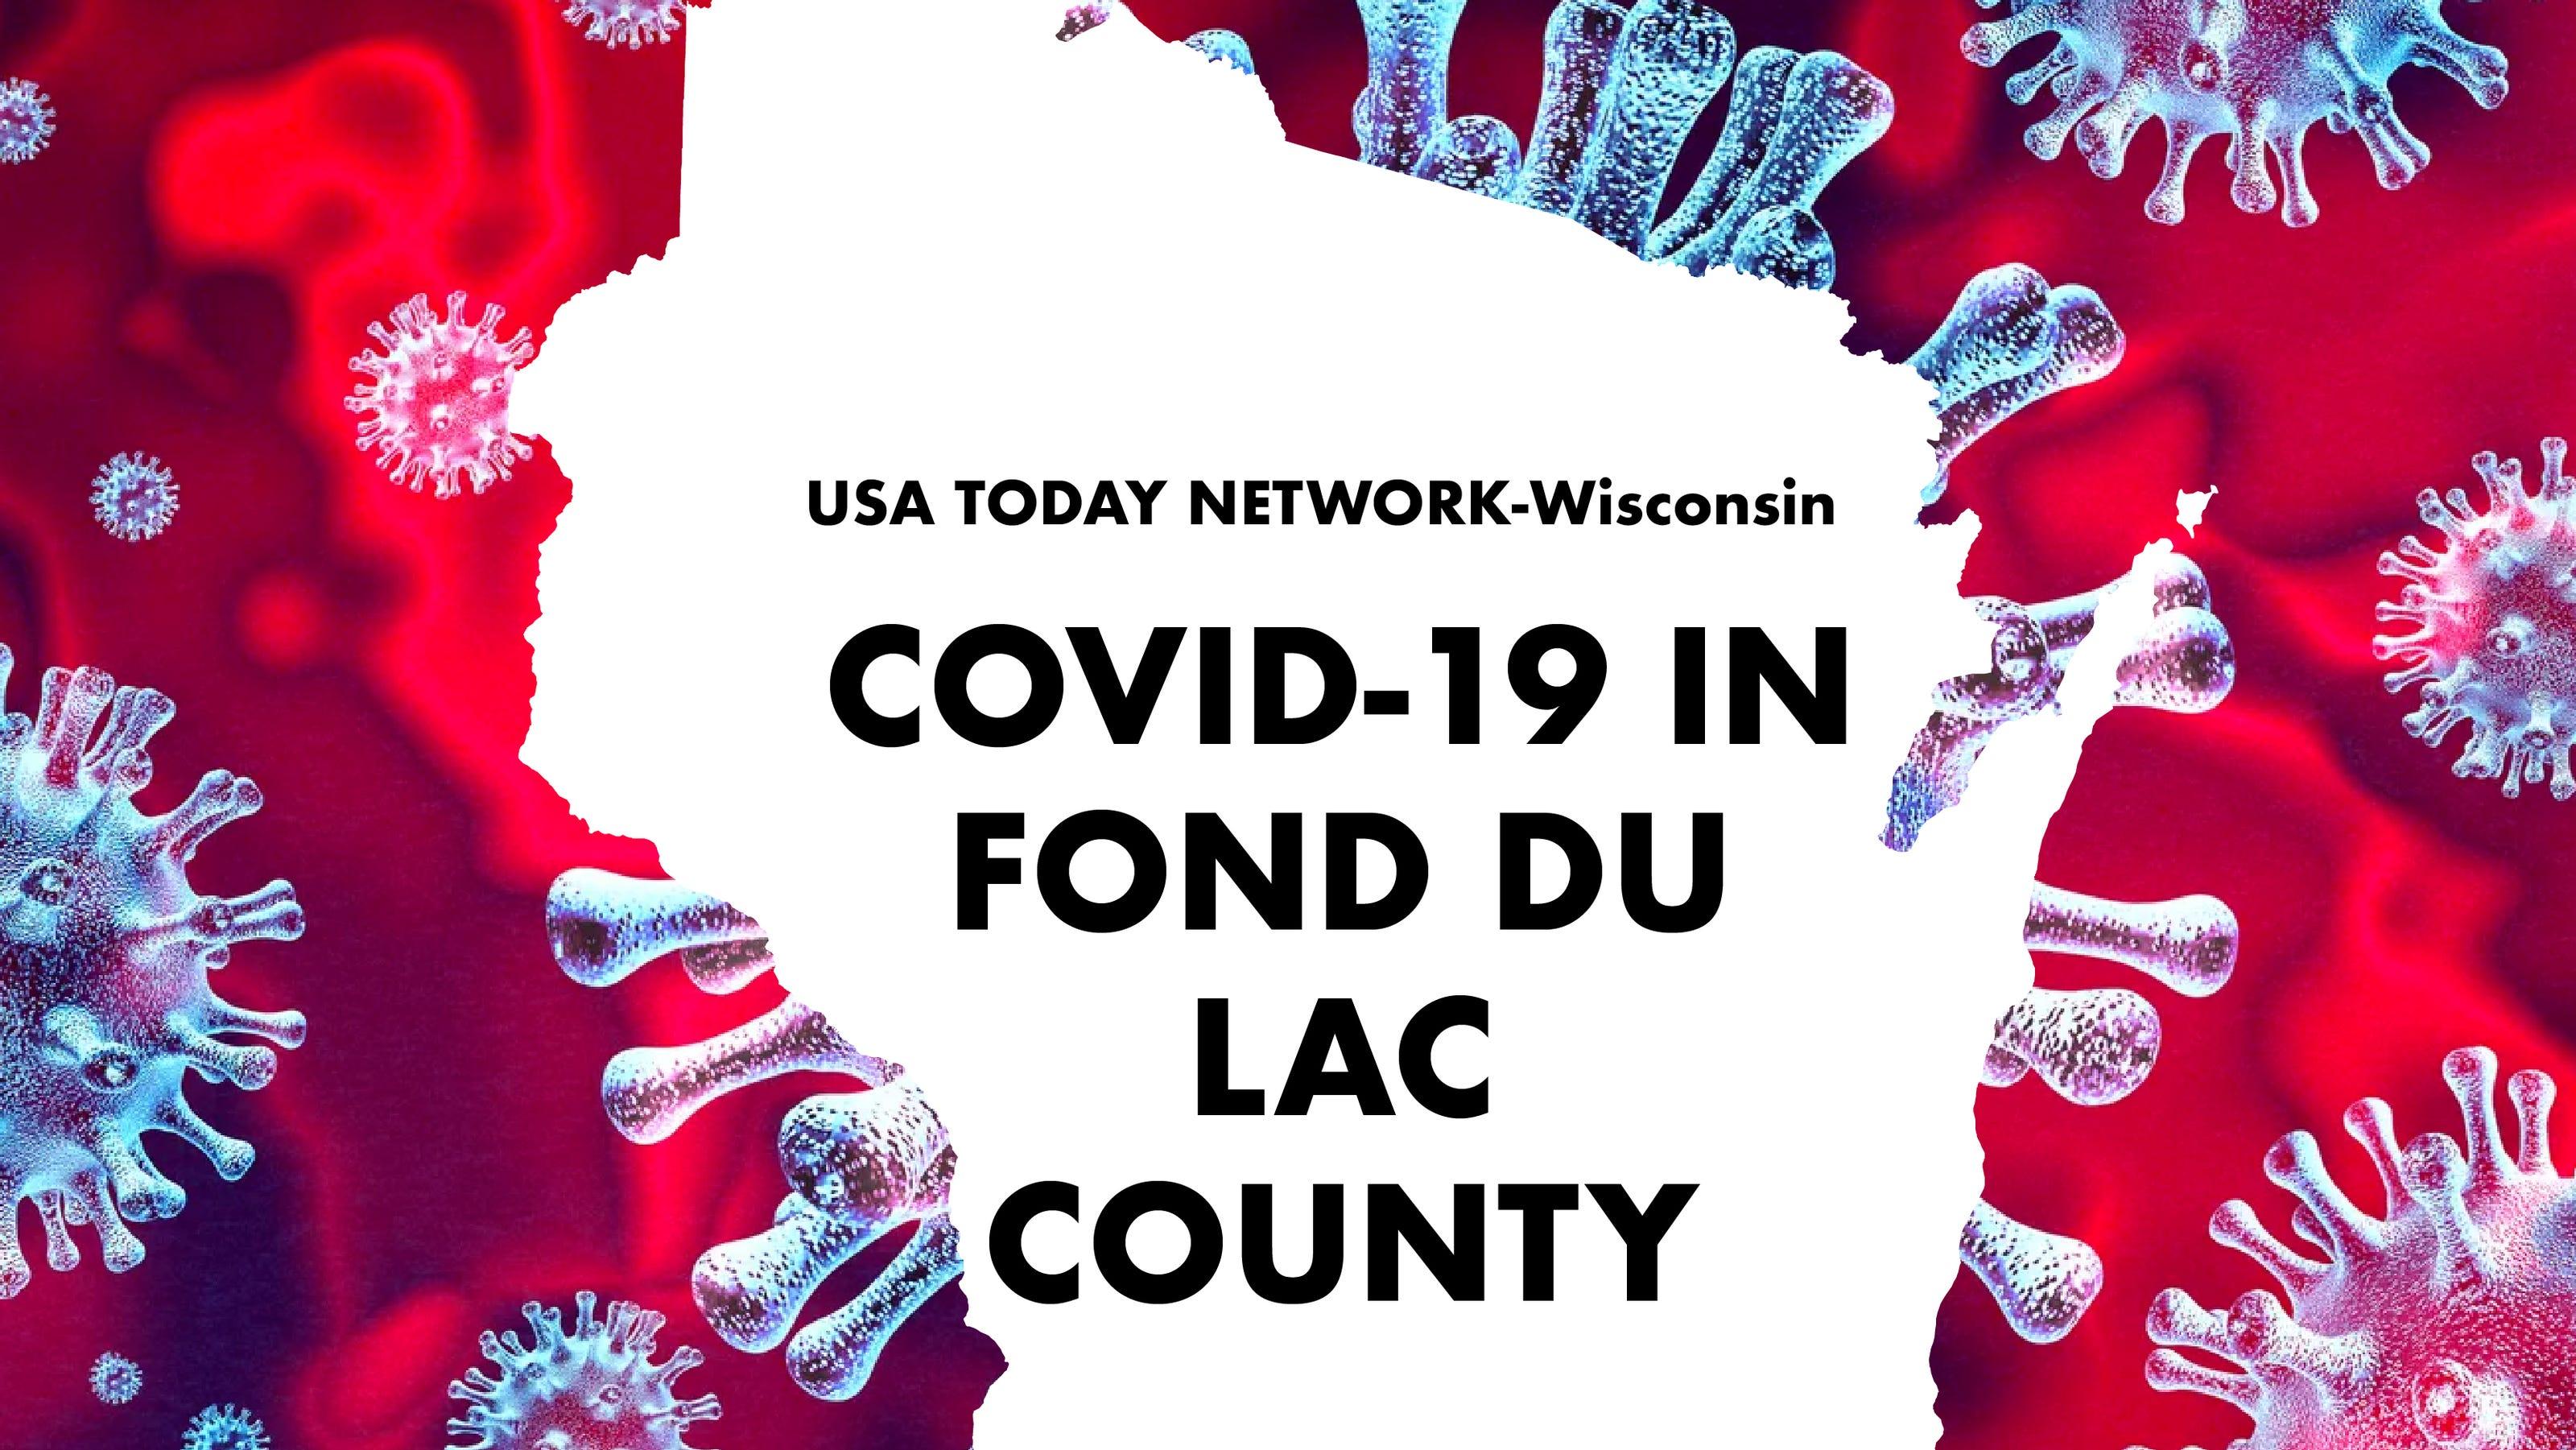 3e2c2526 4d57 4adf 9893 c75d6670abc7 COVID 19 Fond Du Lac County jpg?crop=3333,1875,x0,y723&width=3200&height=1801&format=pjpg&auto=webp.